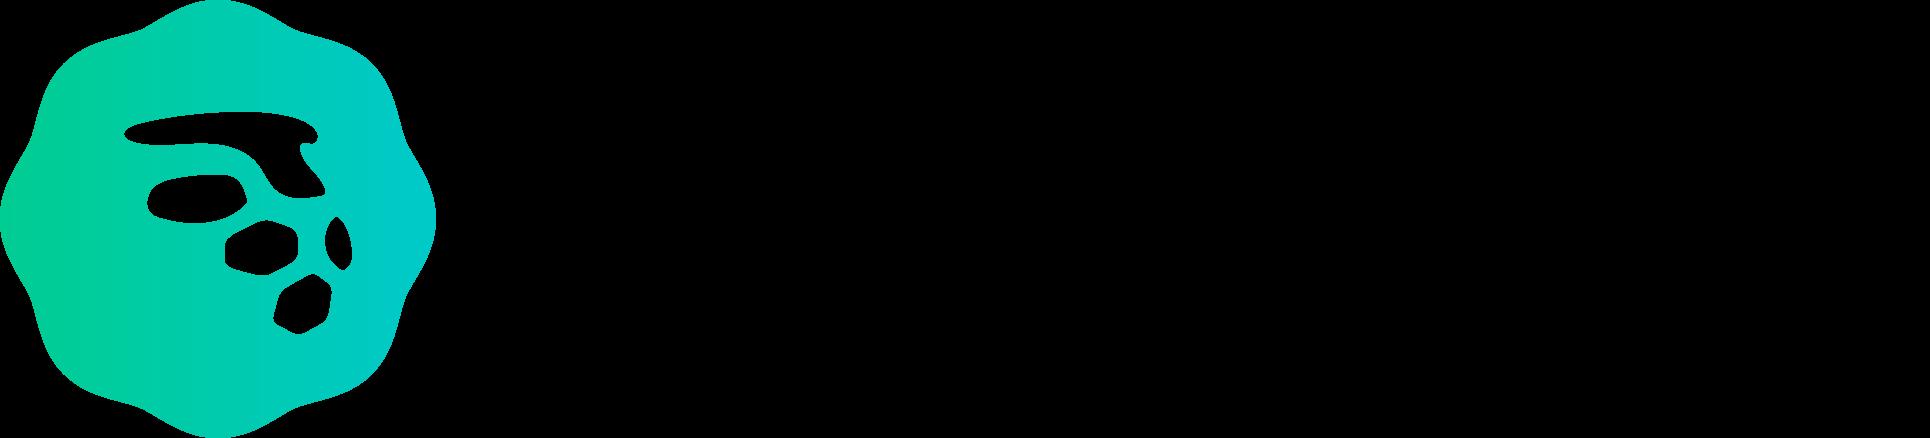 moneylion logo.png